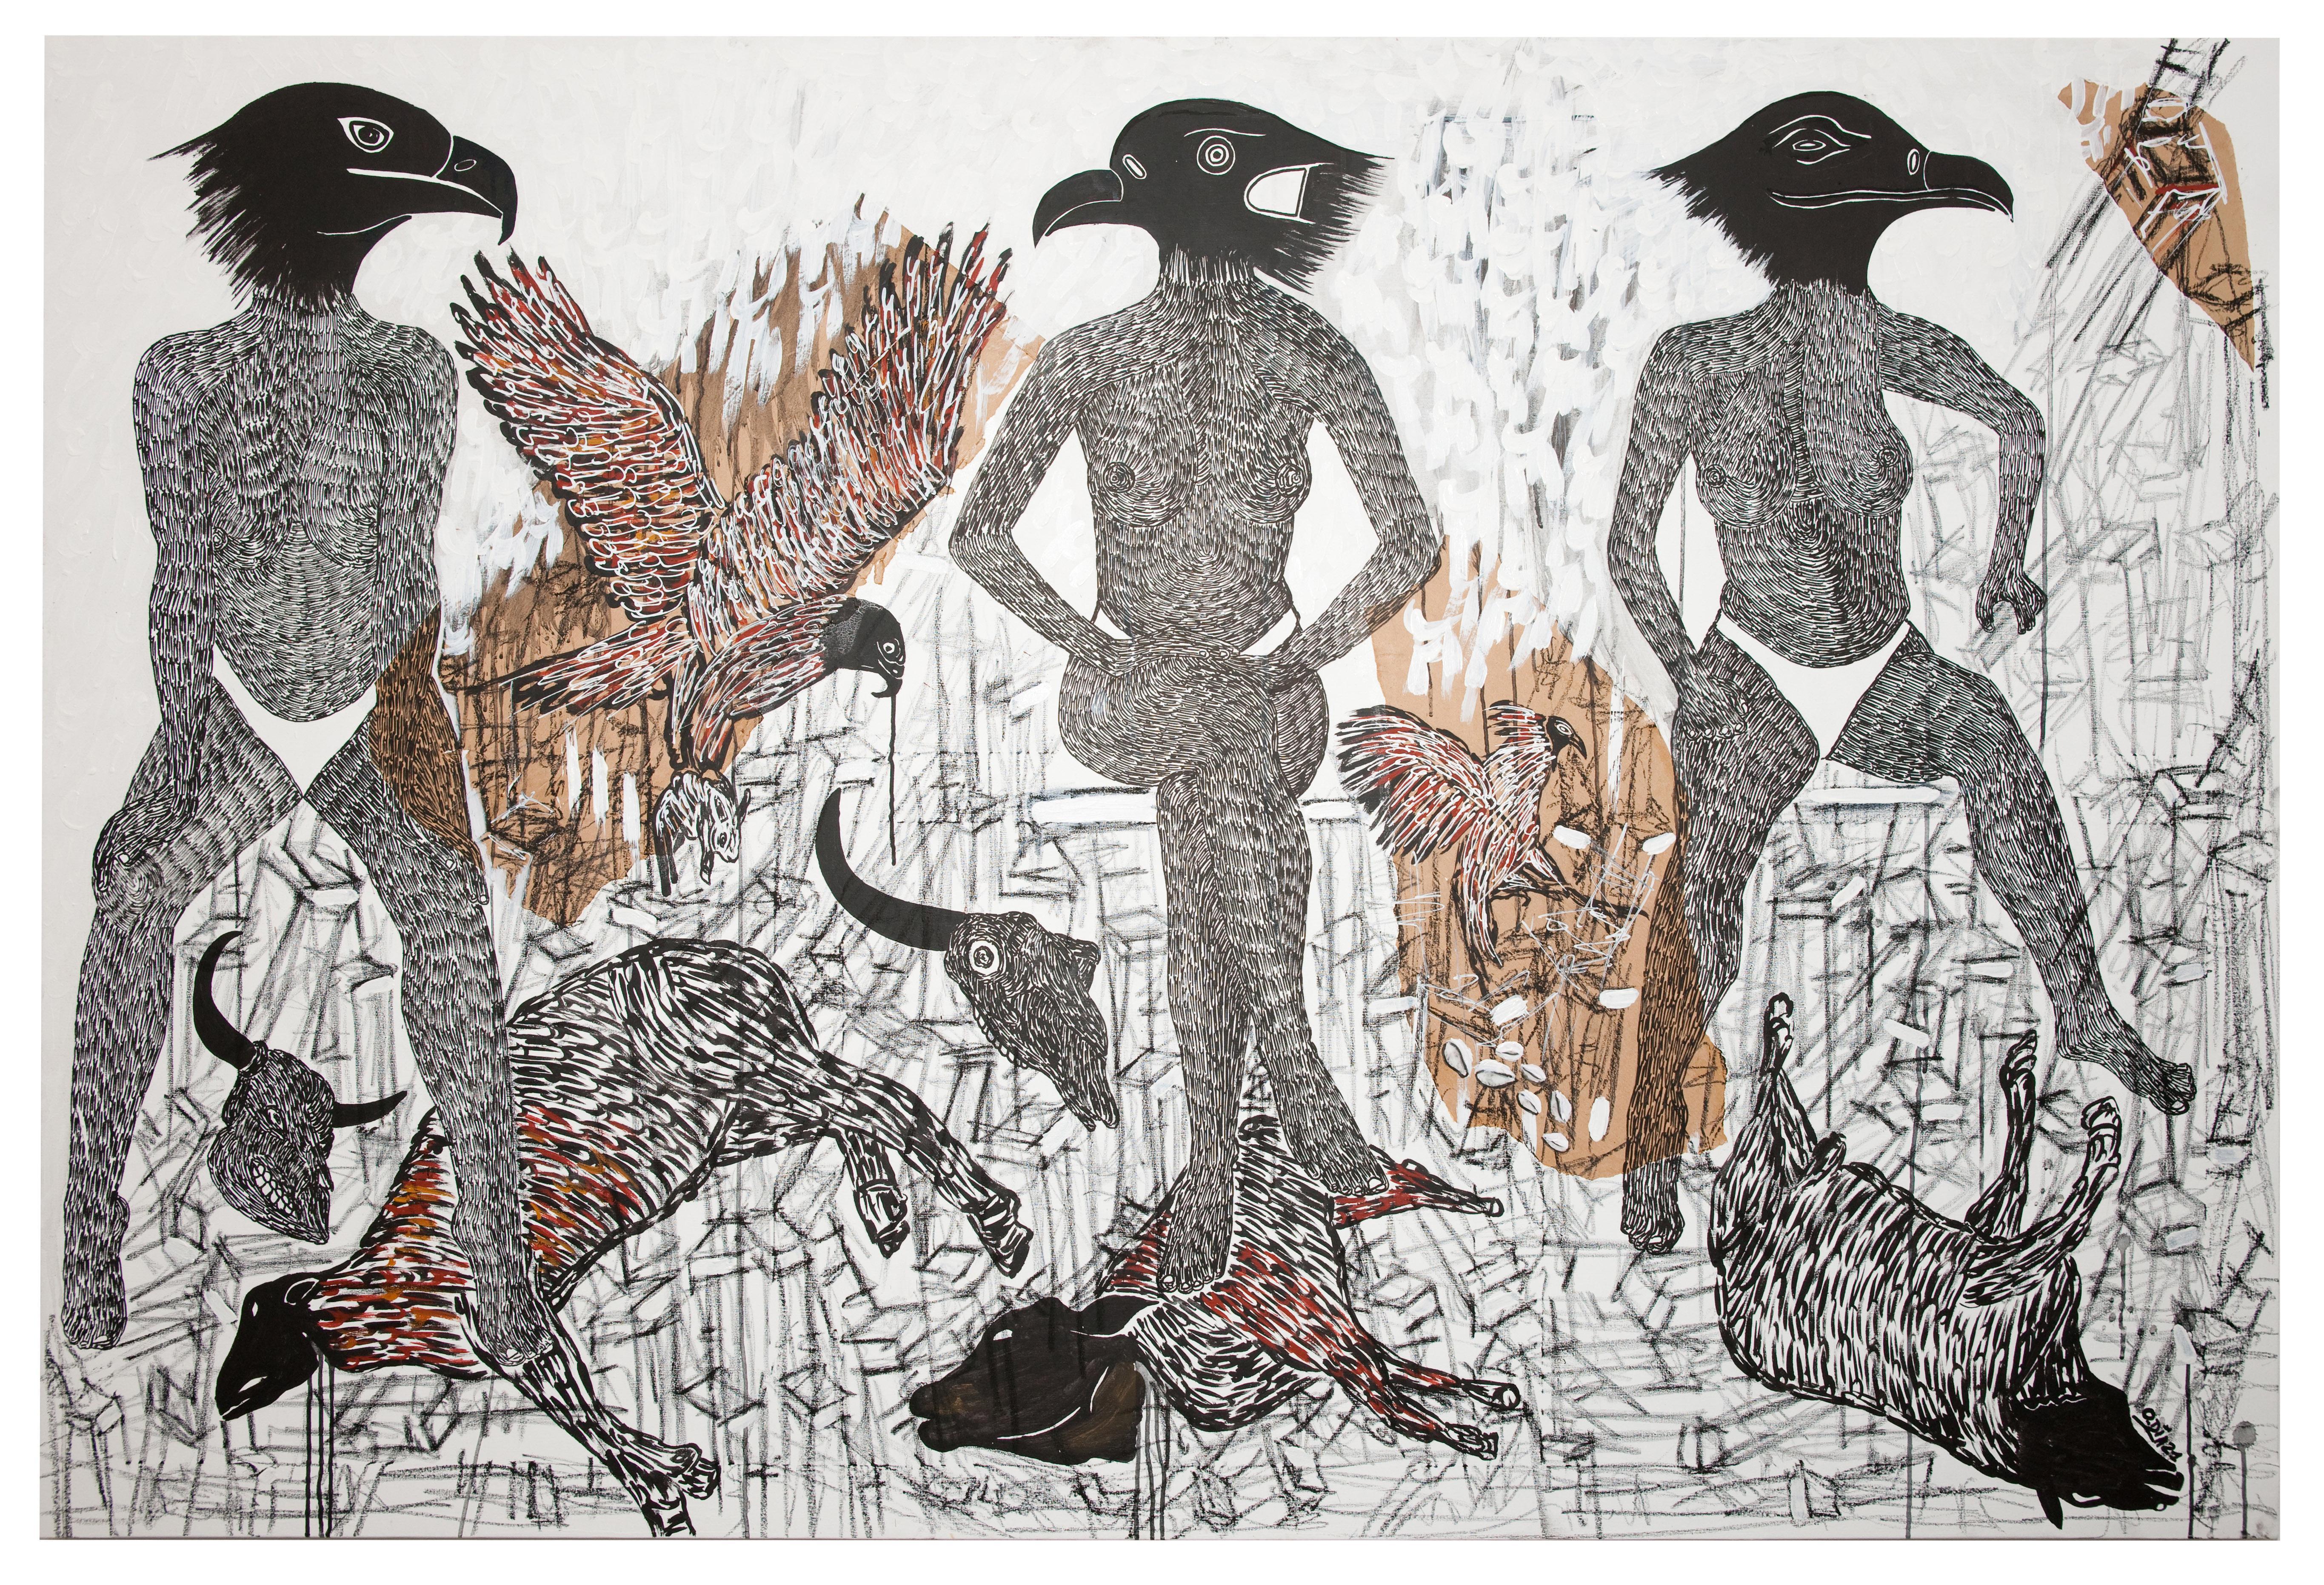 African Contemporary Art - Pacte Mystique